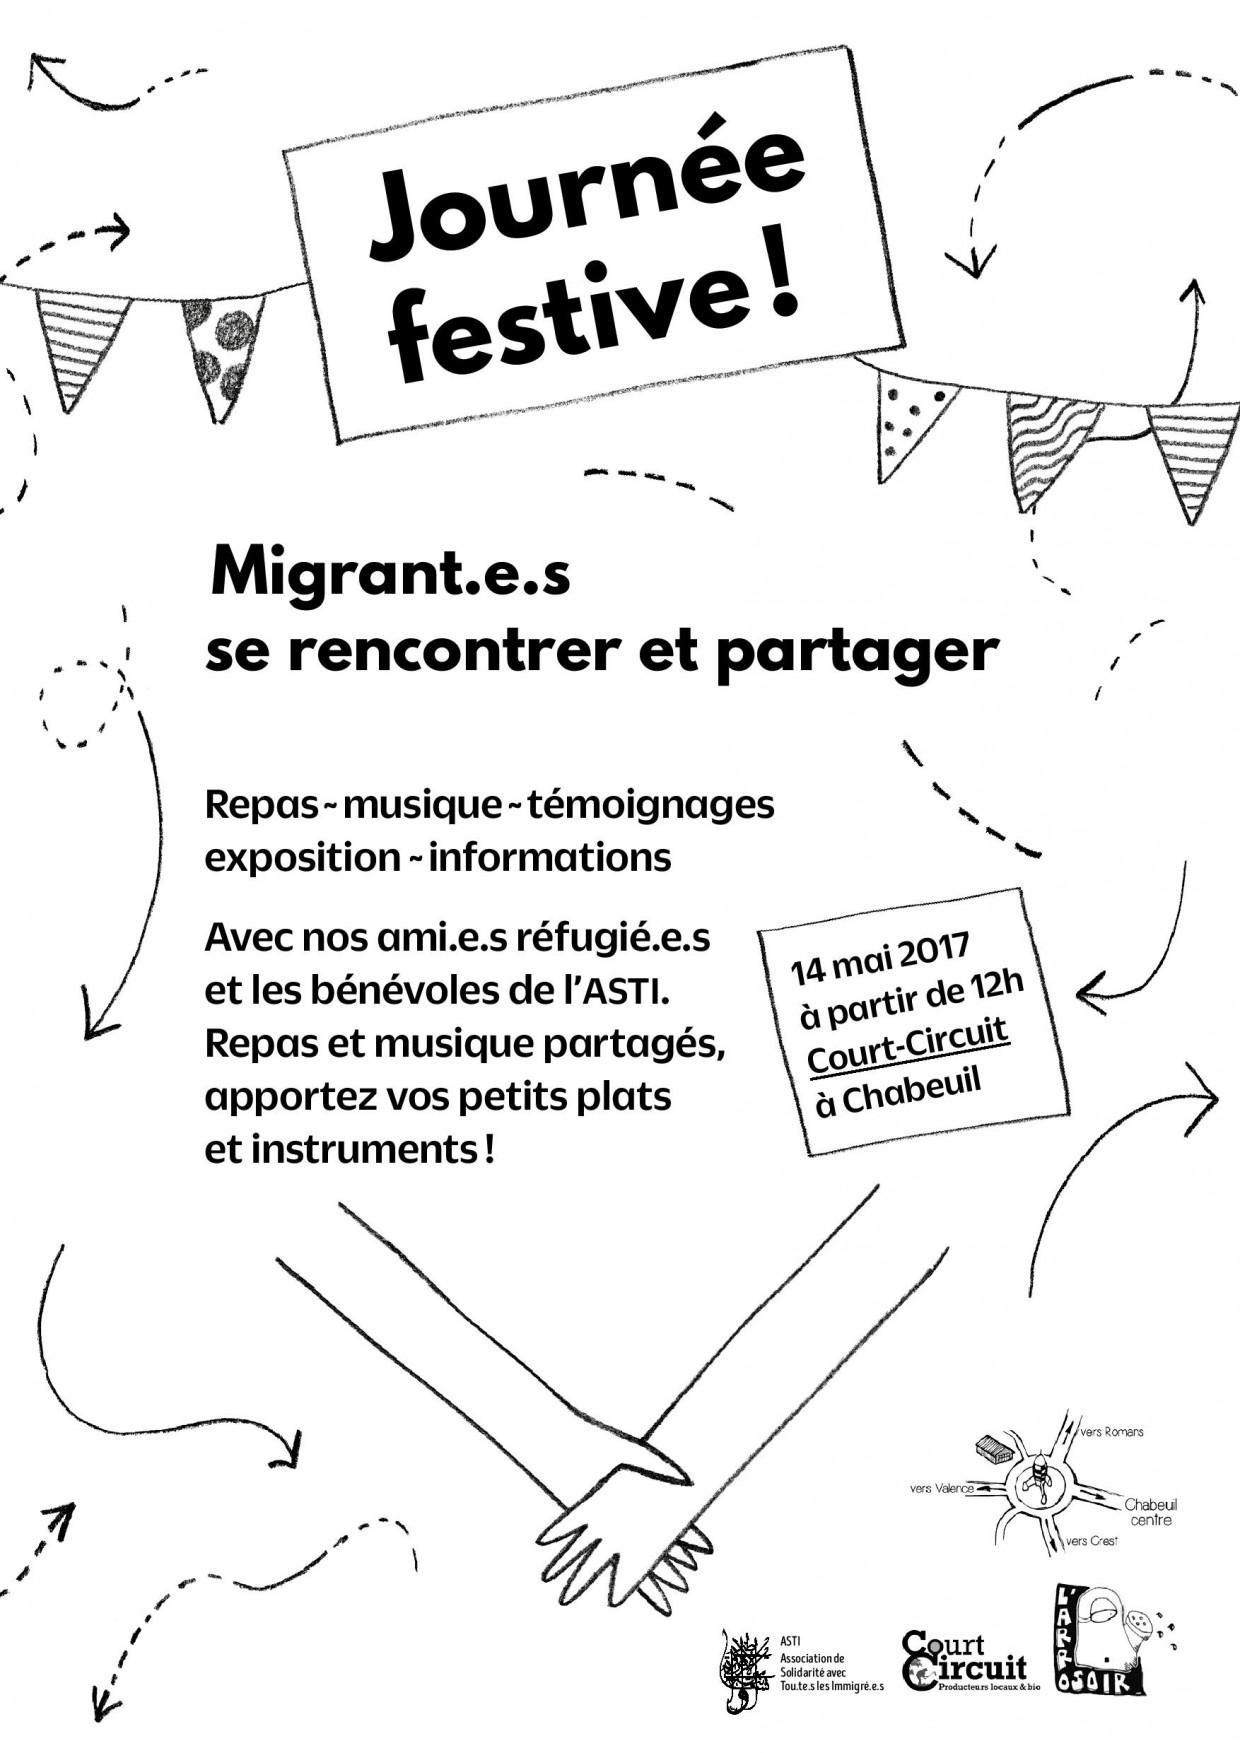 JOURNÉE FESTIVE DIMANCHE 14 MAI